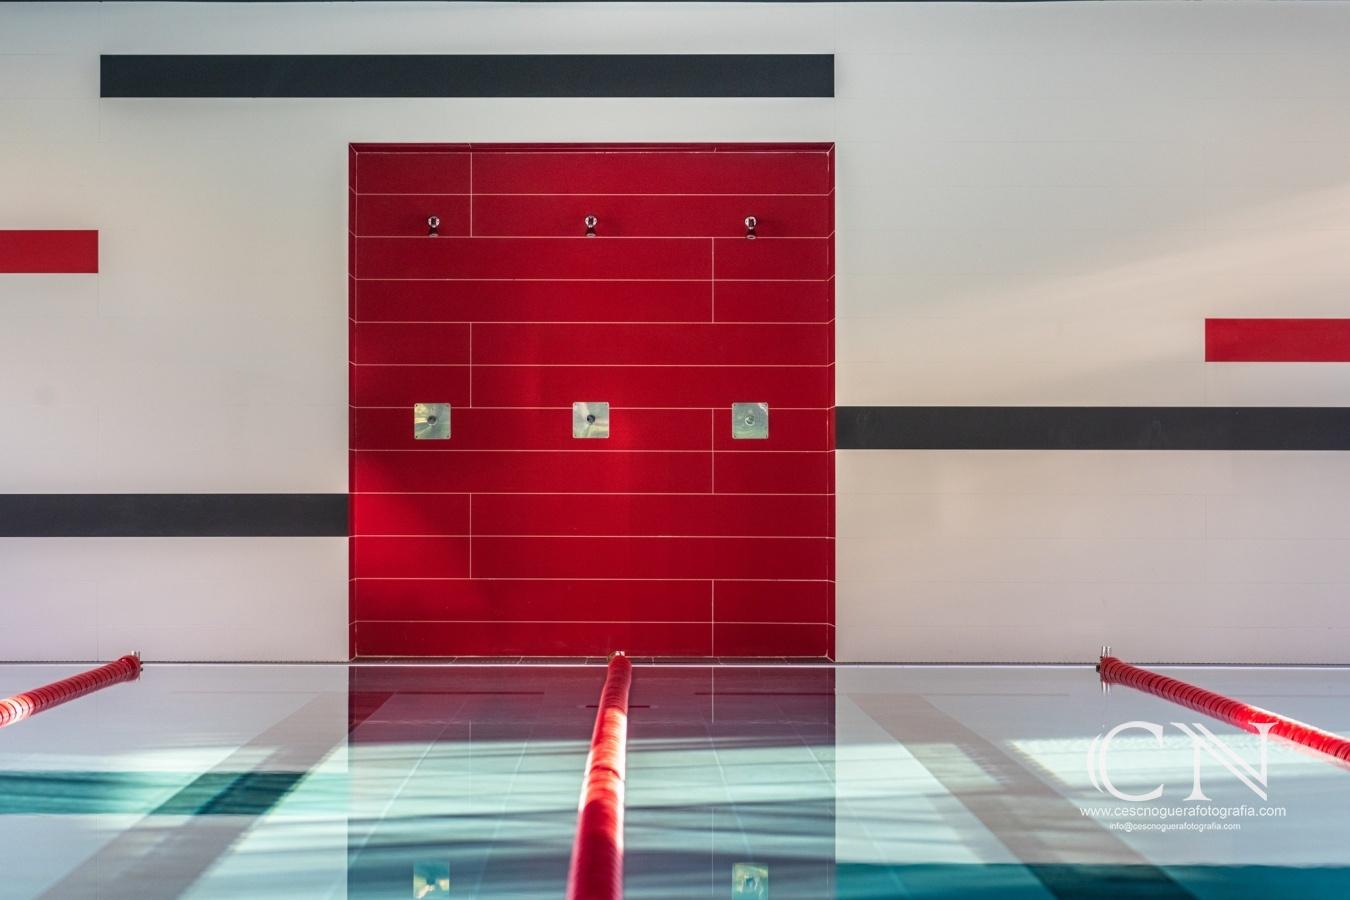 Espai d'Aigua i Salut d'Arbúcies - Cesc Noguera Fotografia,  Architectural & Interior design photographer / Landscape Photography.